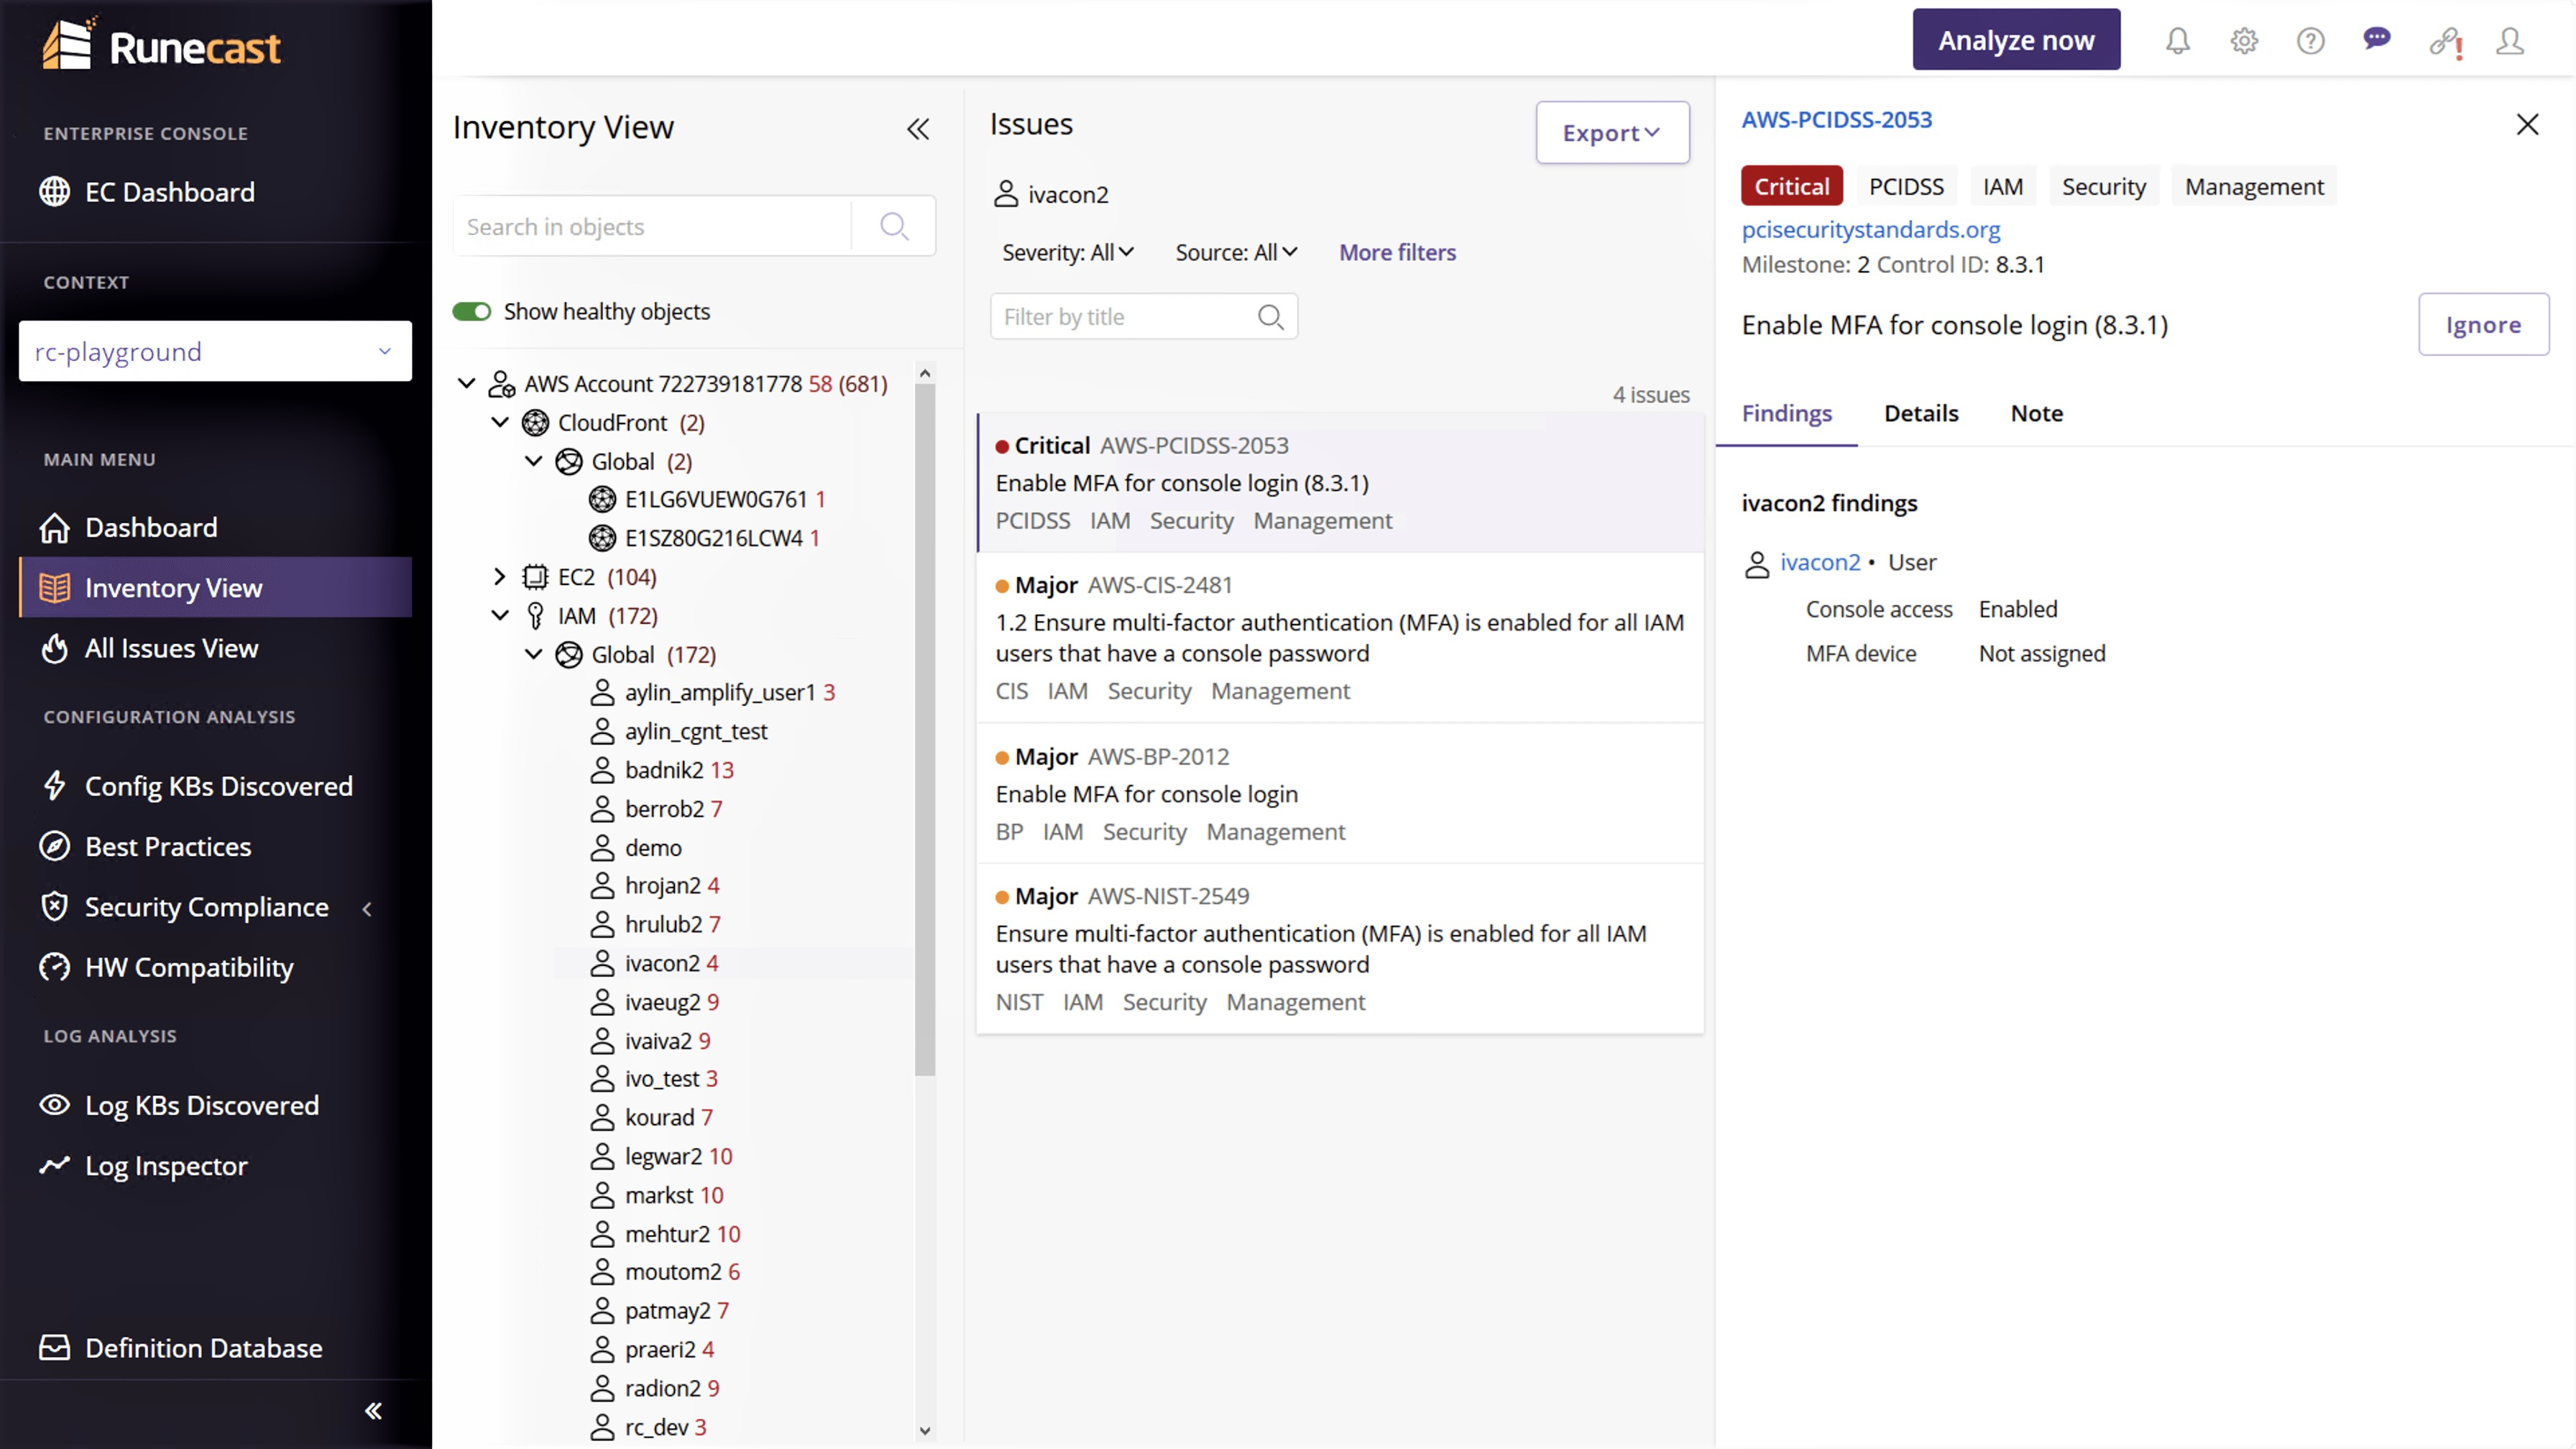 Runecast Analyzer - AWS - Inventory View